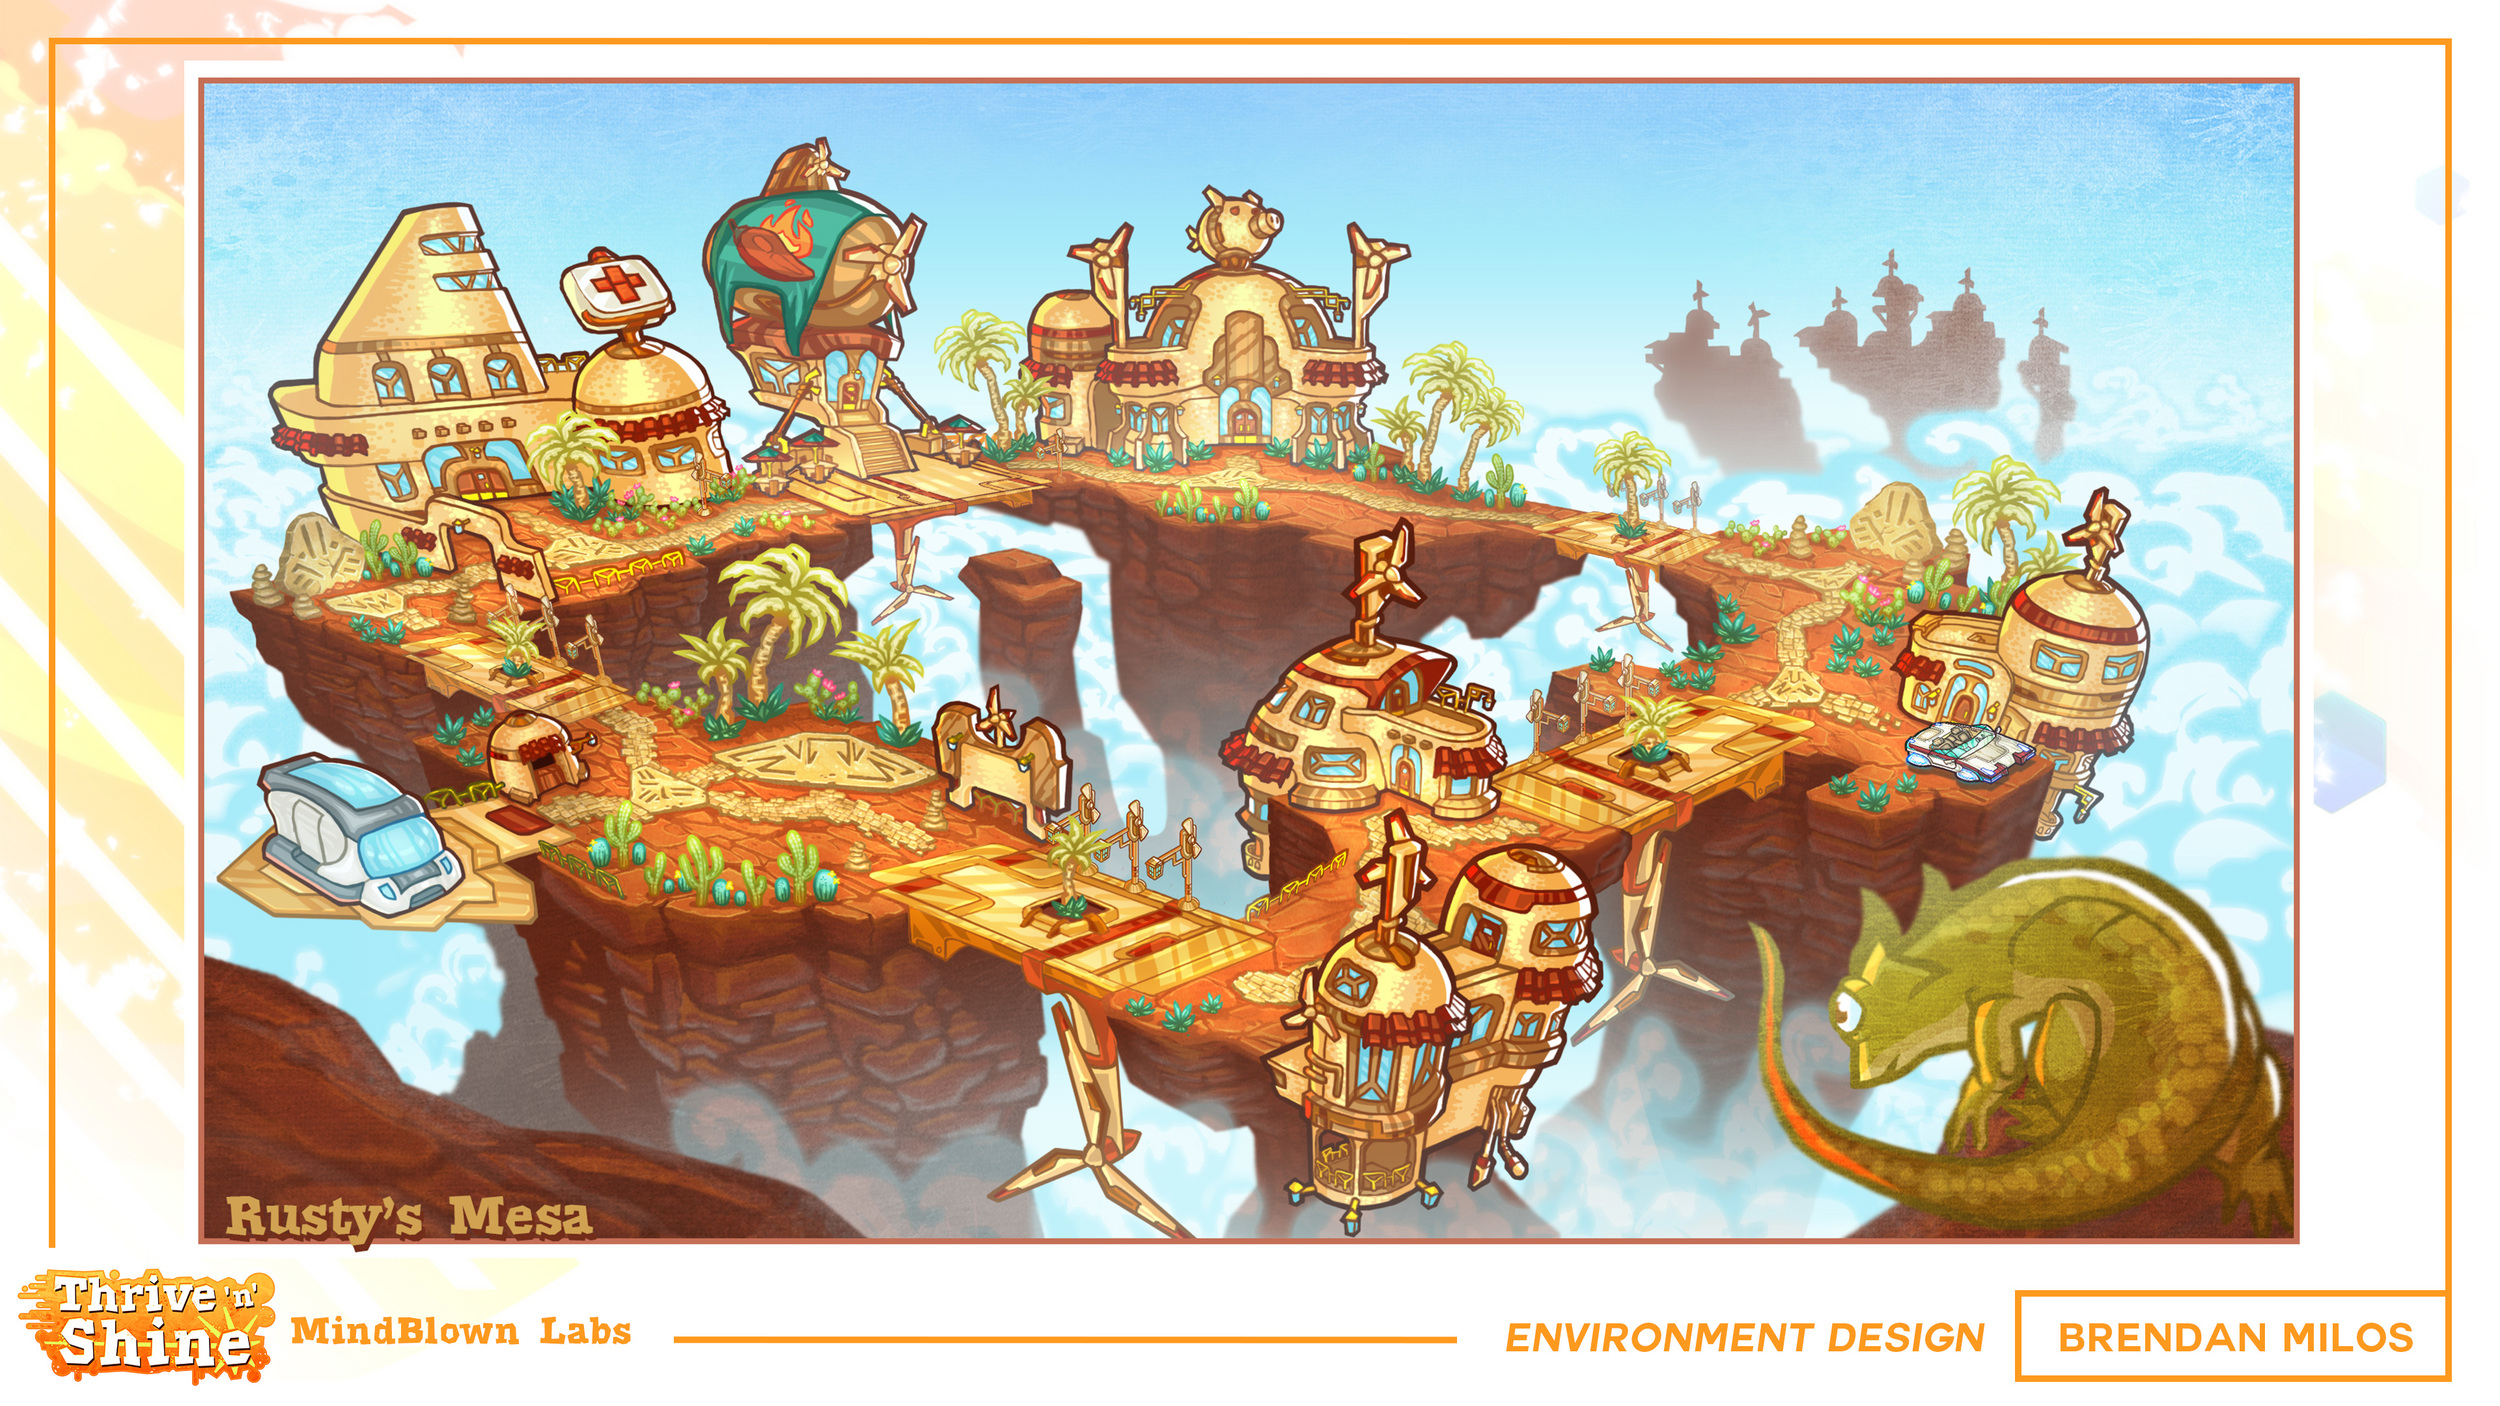 Art-Portfolio-MBL_EnvironmentDesign.jpg